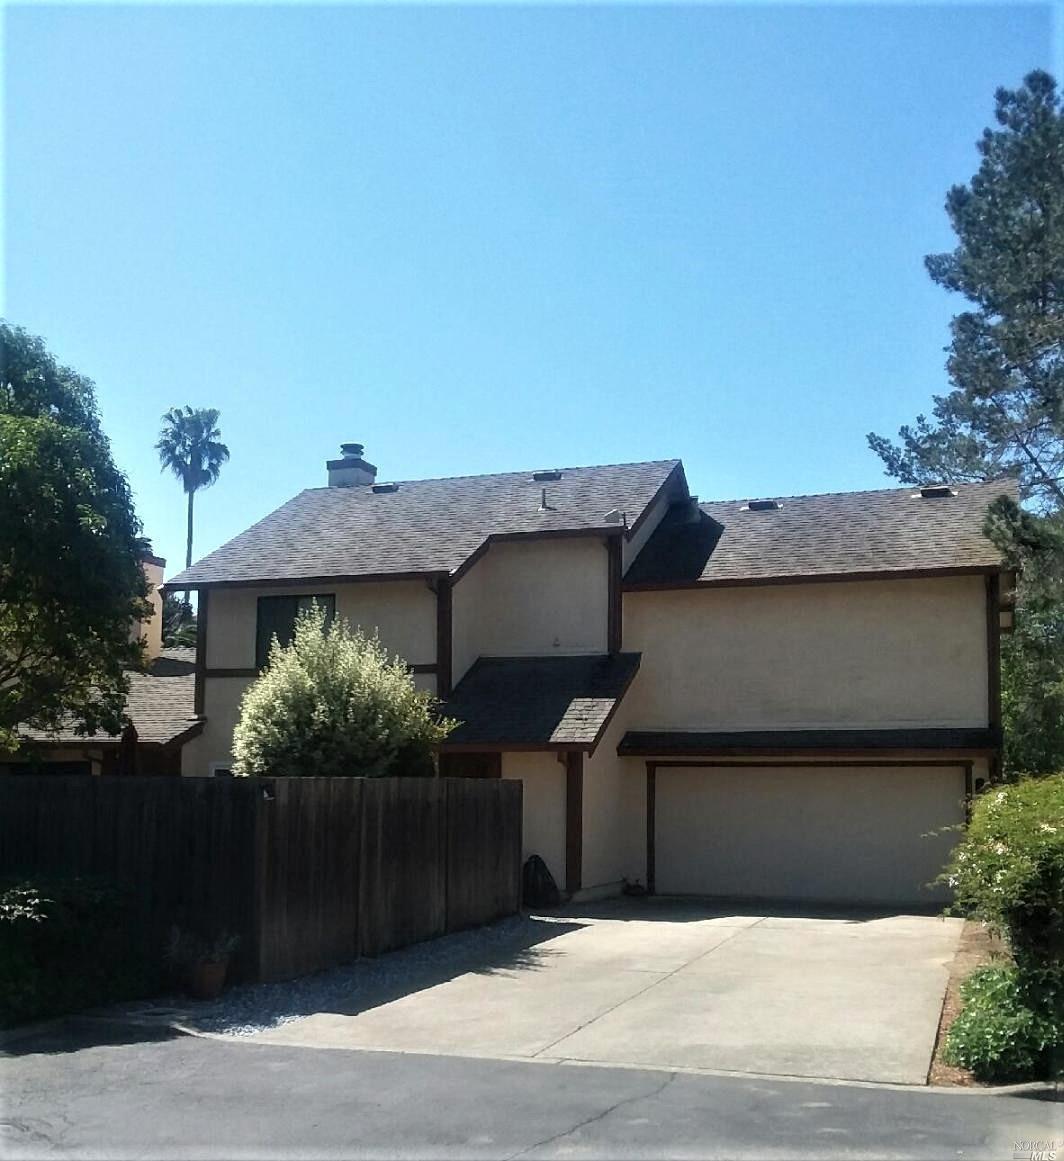 465 Myrtle Court, Benicia CA 94510